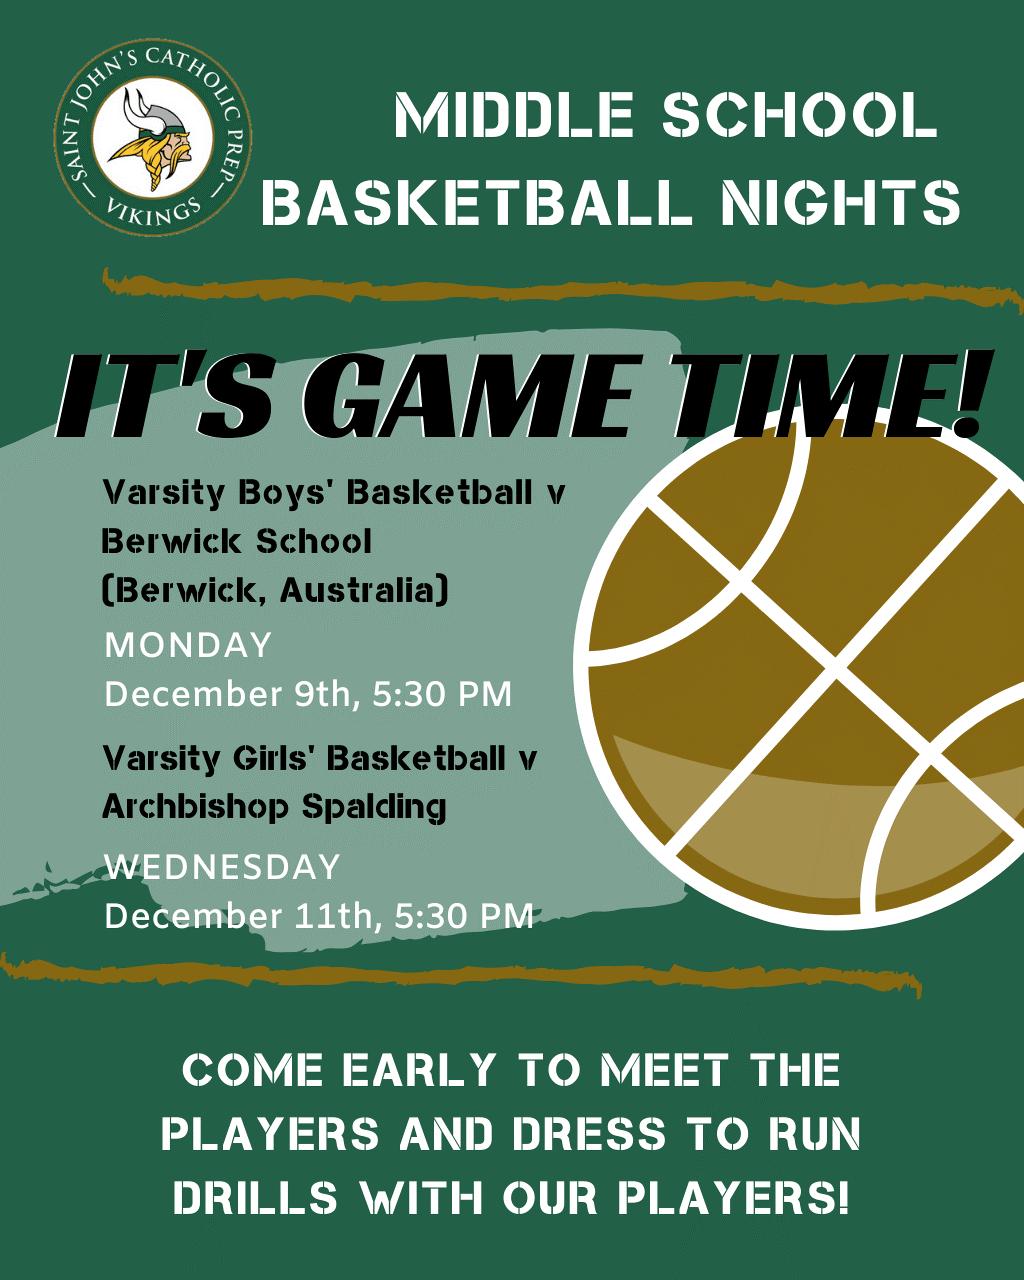 Middle School Basketball Nights